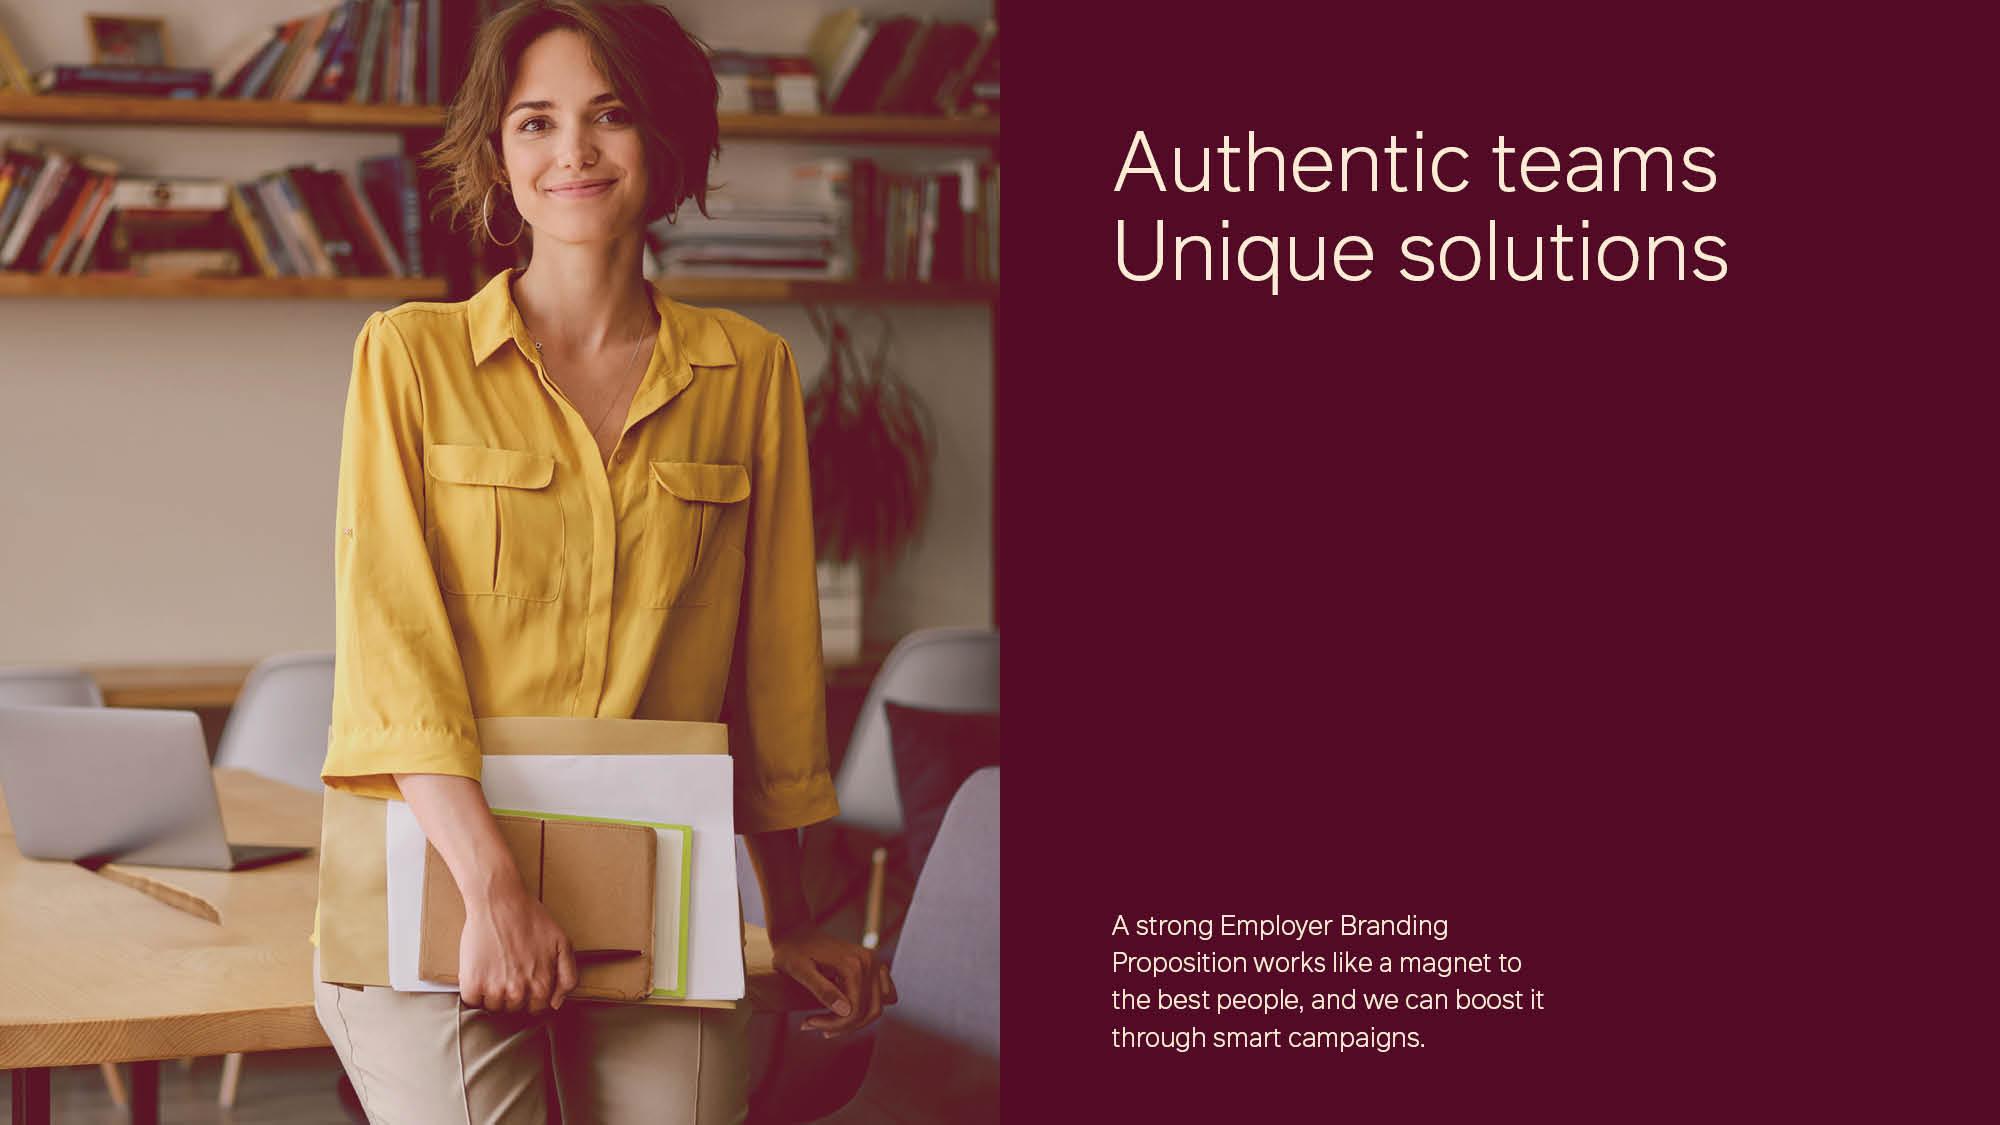 Lanatta-Branding-and-Design-Culture-Code3